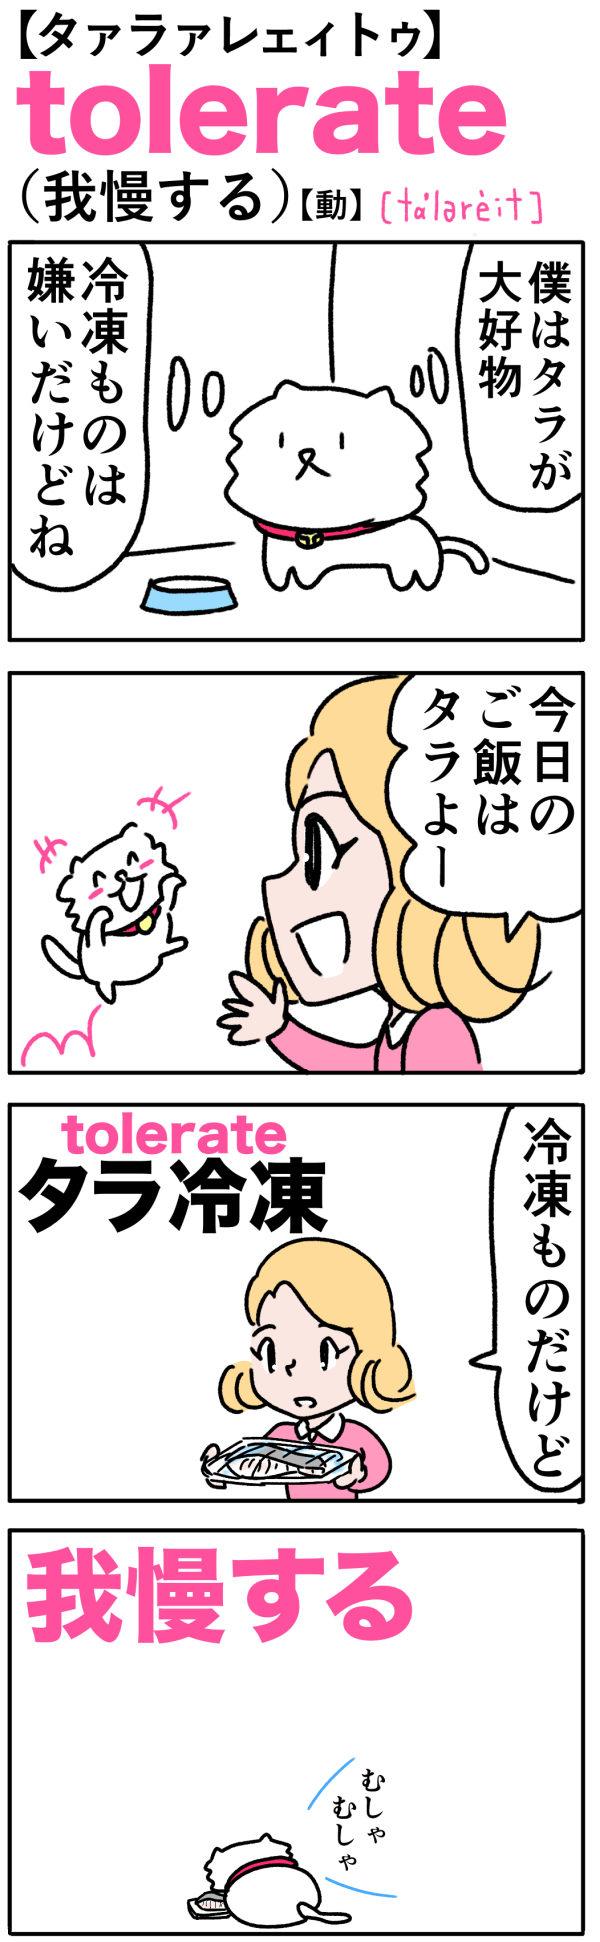 tolerate(我慢する)の語呂合わせ英単語